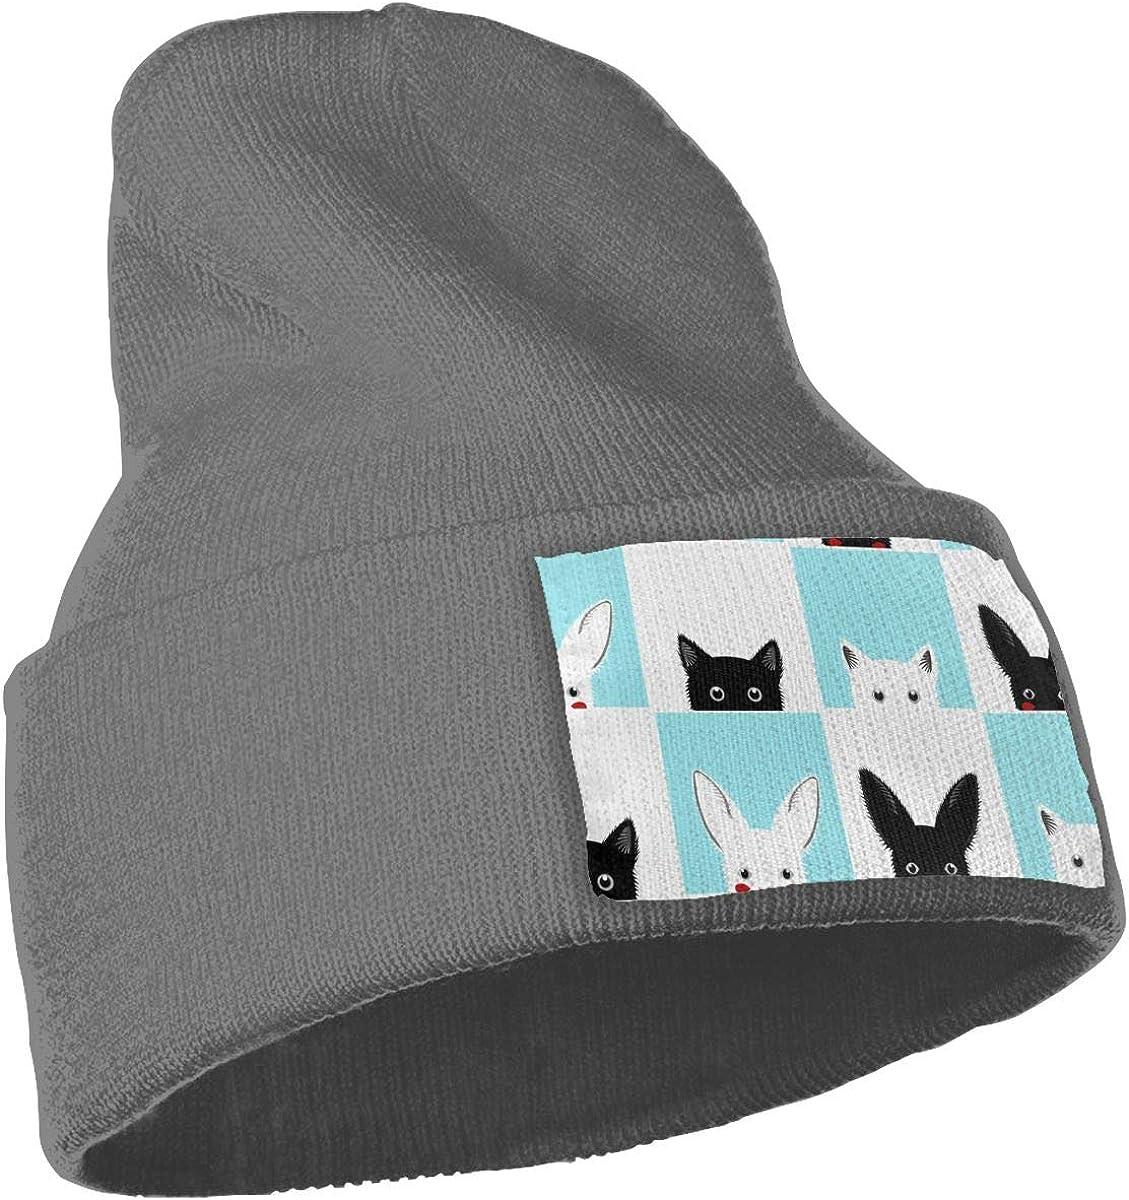 Cat Rabbit Chess Board Skull Caps Men /& Women Winter Warm Stretchy Knitting Beanie Hats